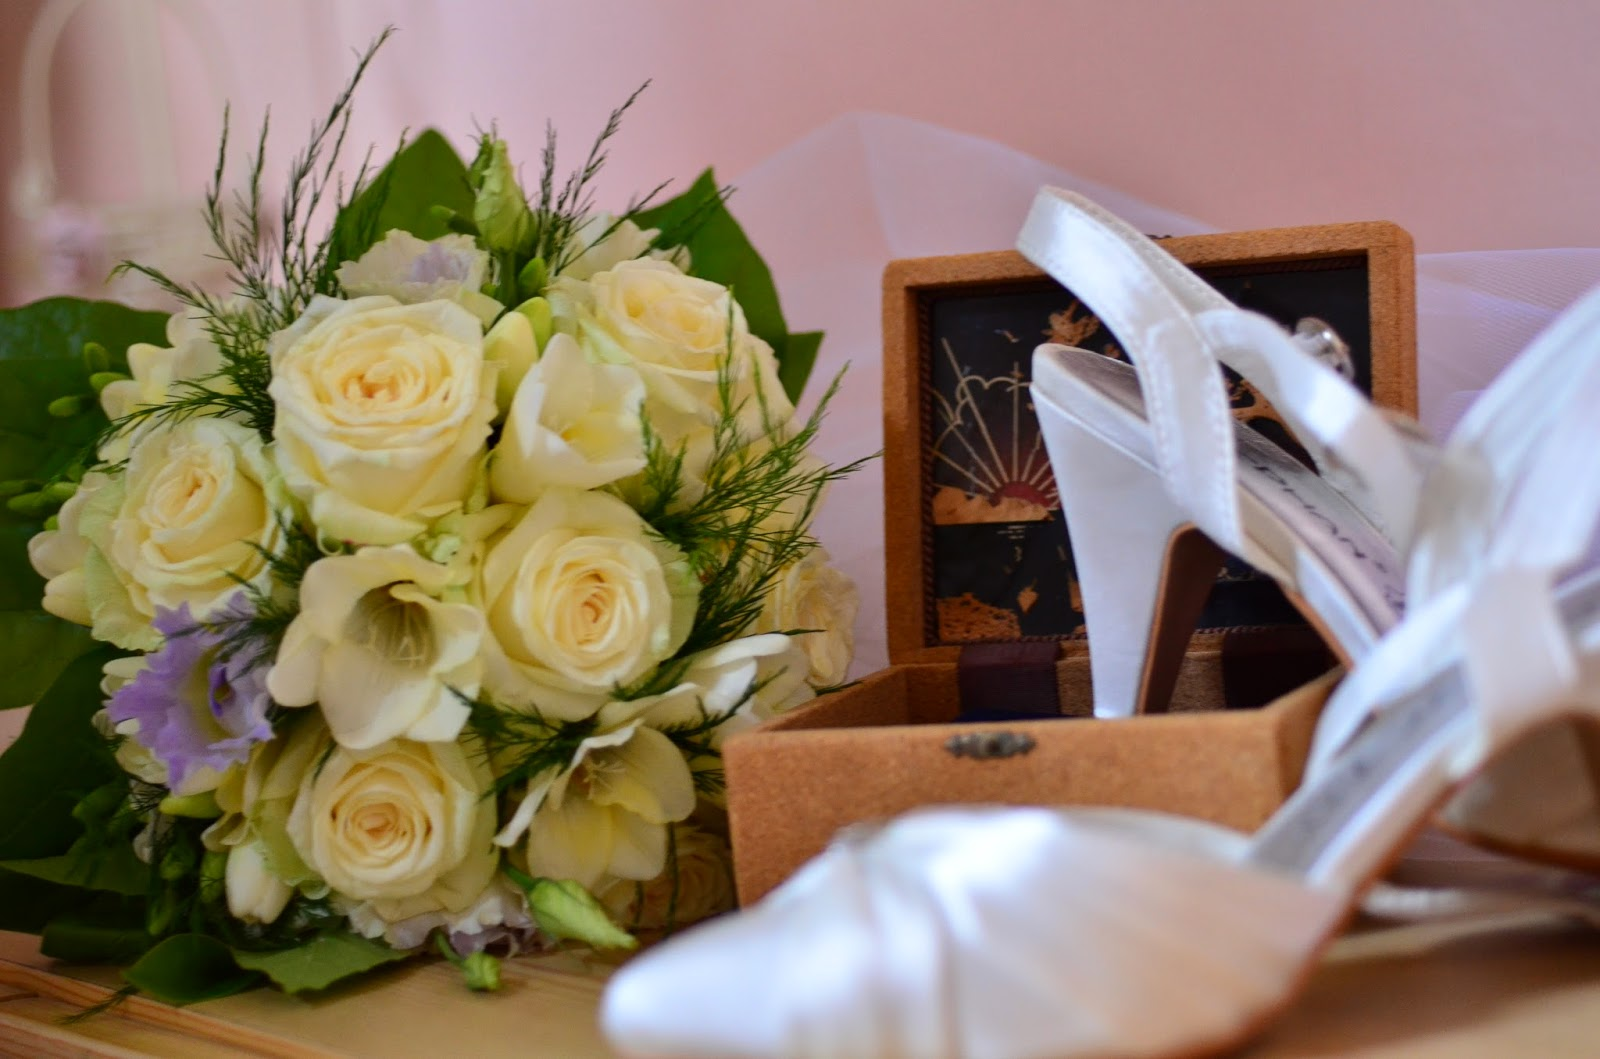 mariage-decoration-voeux-alliance-amour